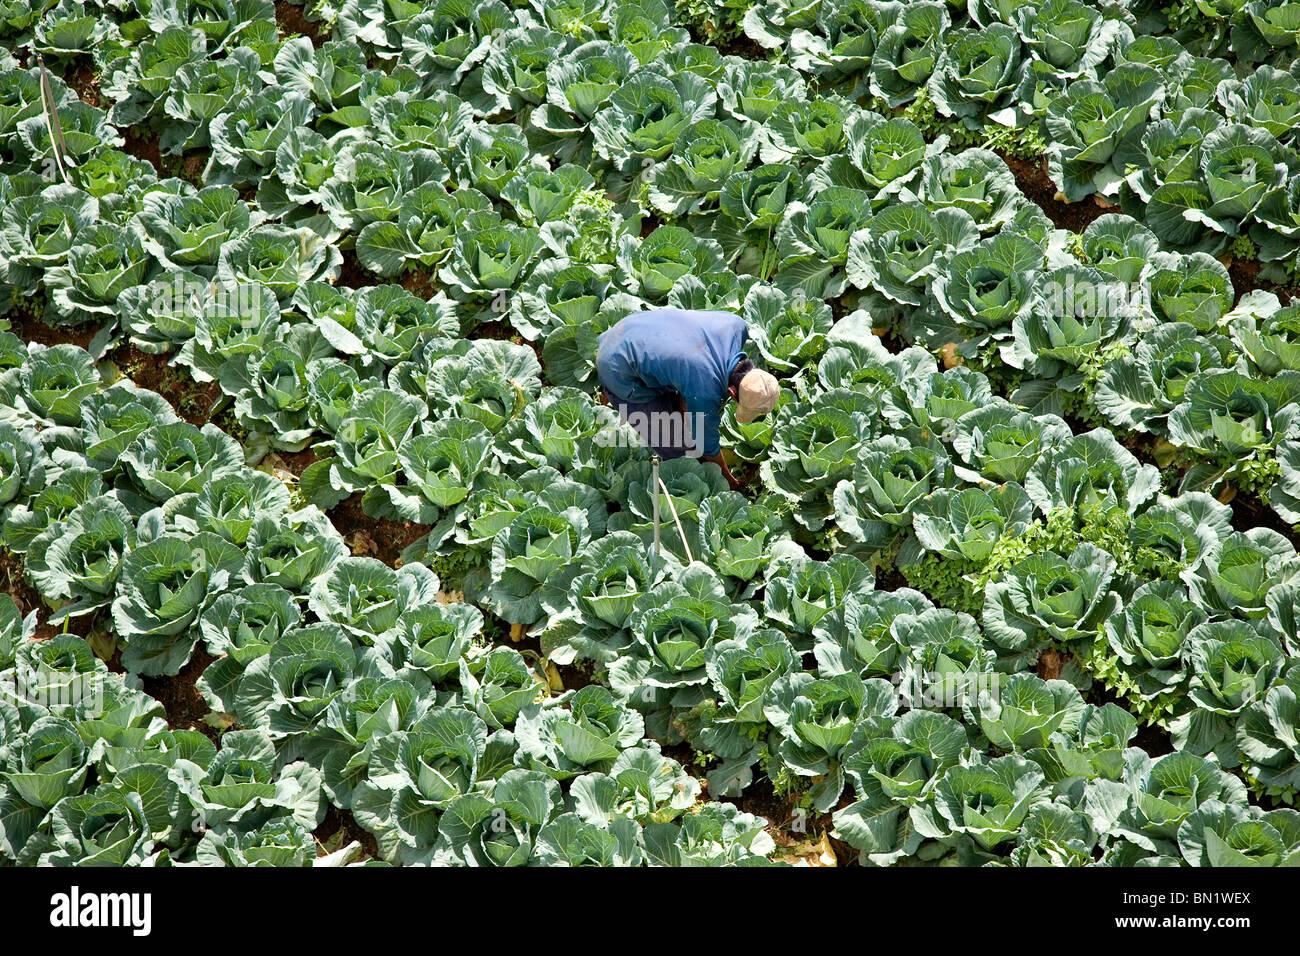 Vietnamese man farming cabbages in Dalat. Stock Photo